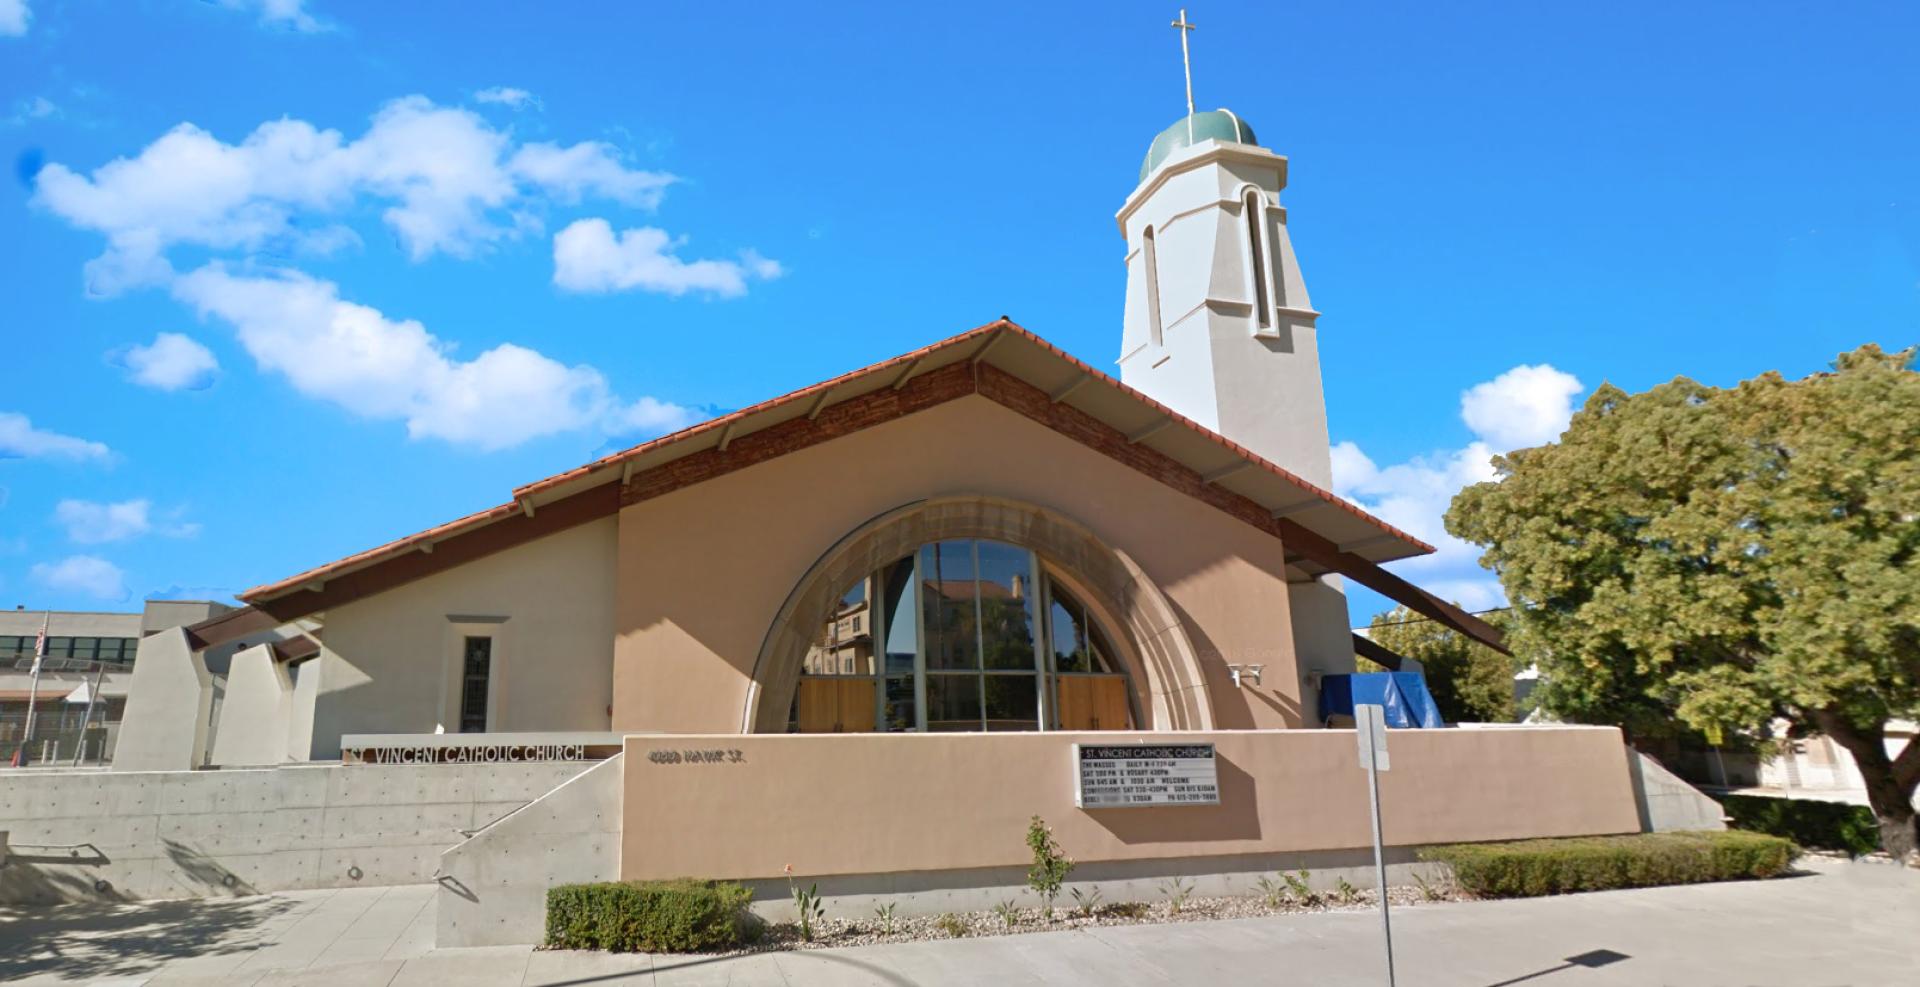 St vincent convent school